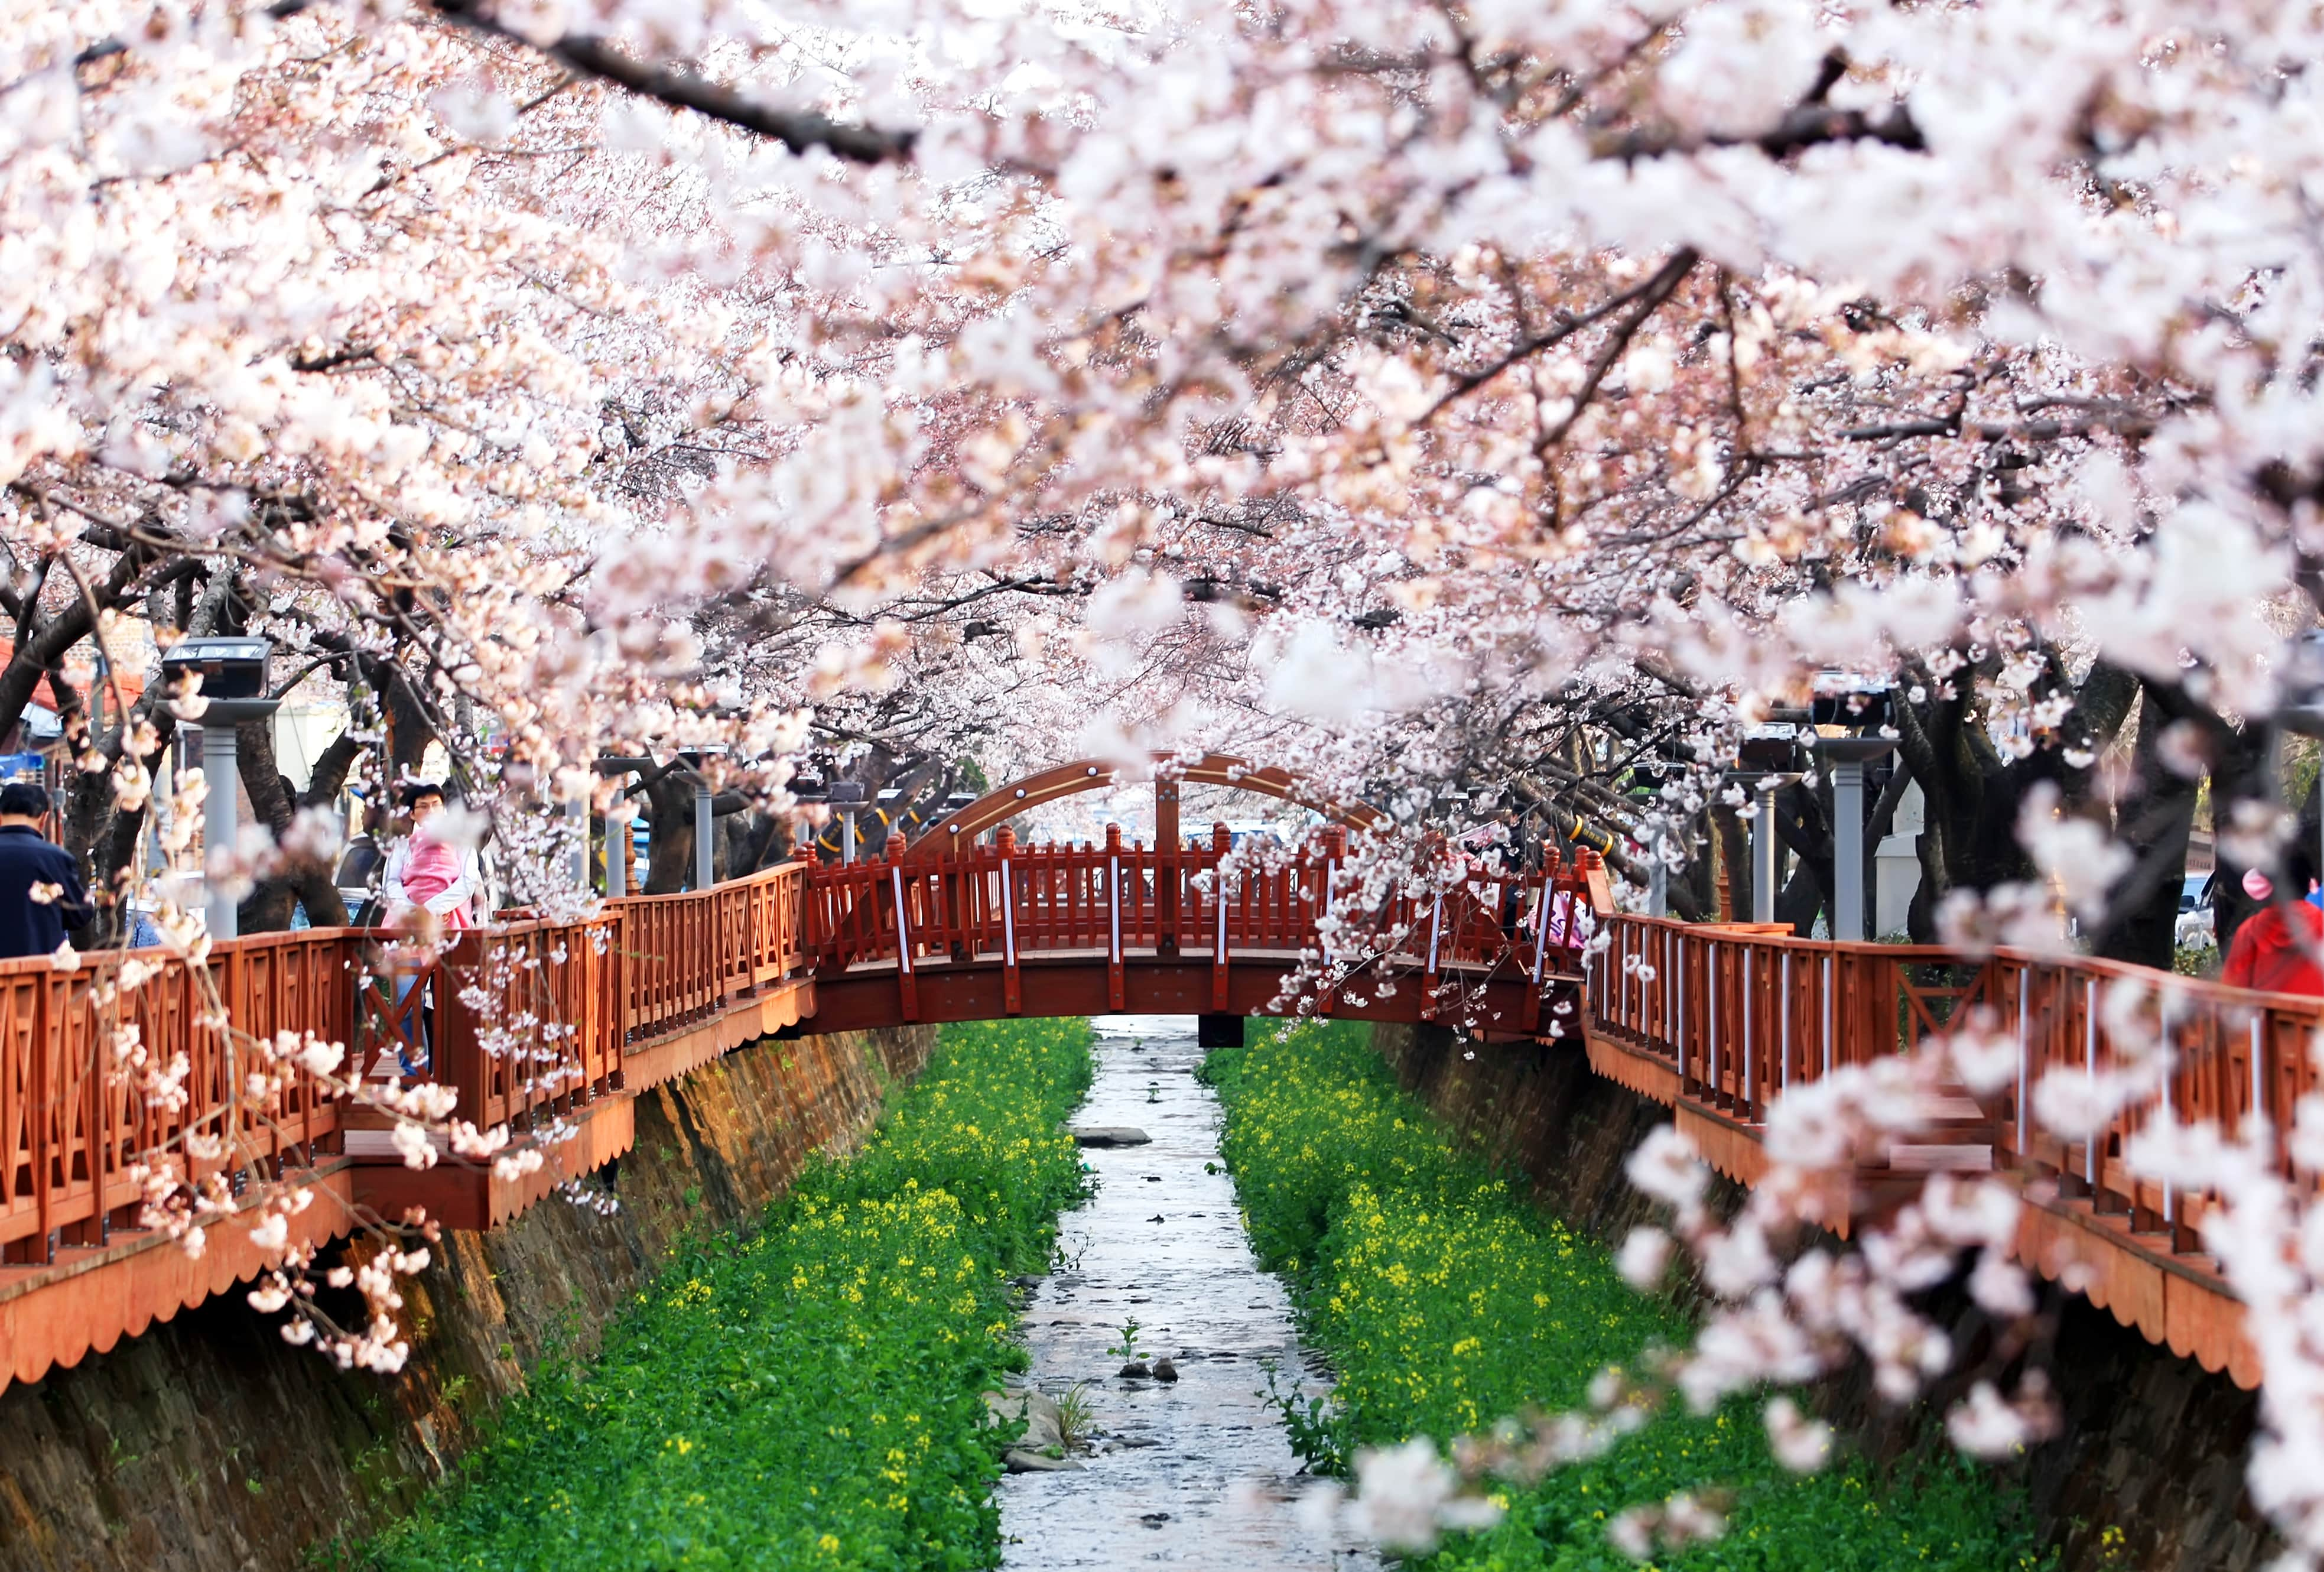 changwon-city-and-cherry-blossom-festival-secret-world